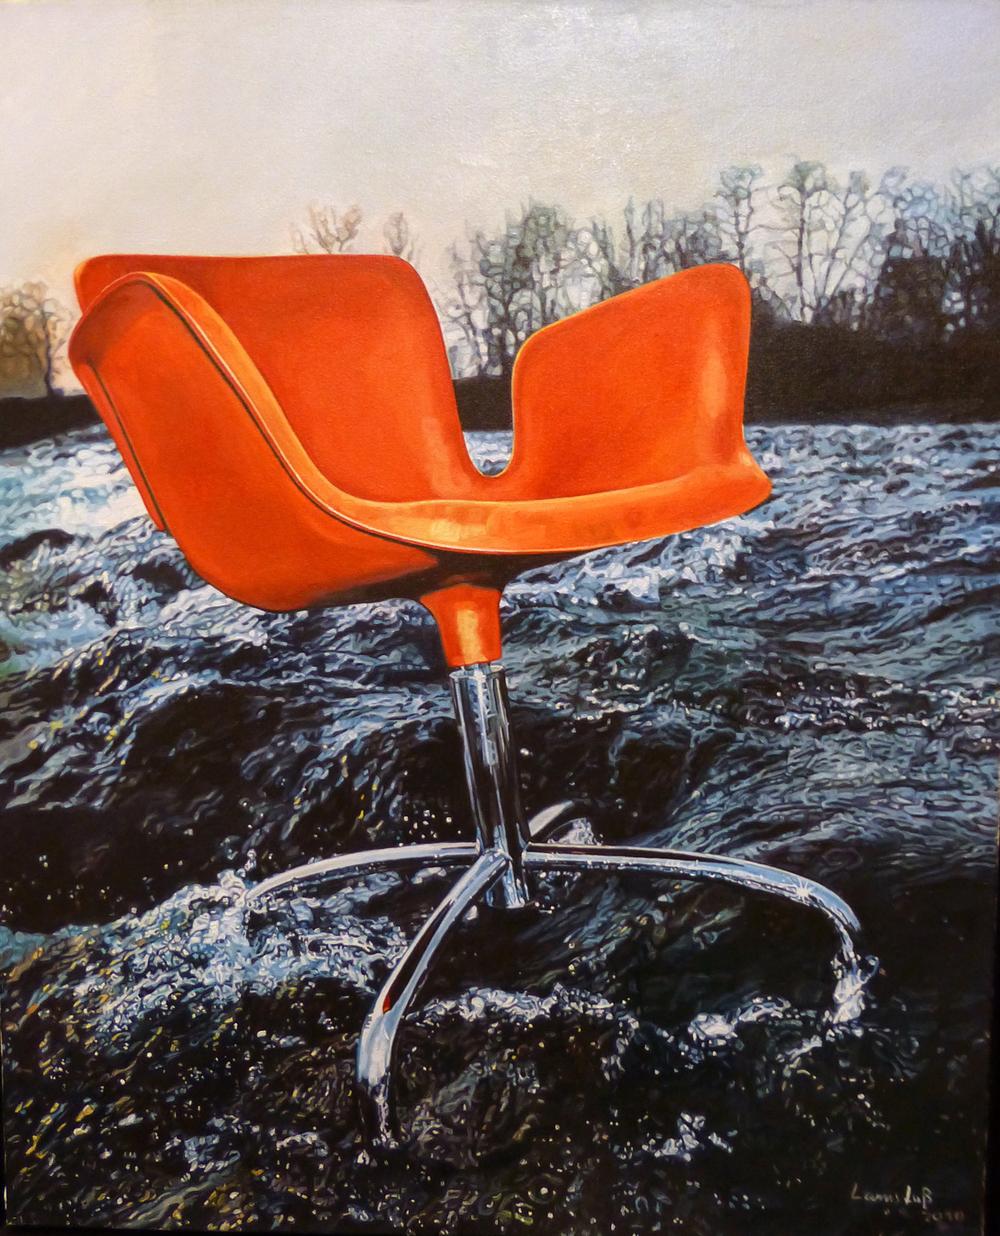 Ulrich Lamsfuss   Sebastiano Pavia, Guilio Cappelini chair (Wallpaper April 1999)  , 2010   oil on canvas   35.43 x 28.74 inches   90 x 73 cm